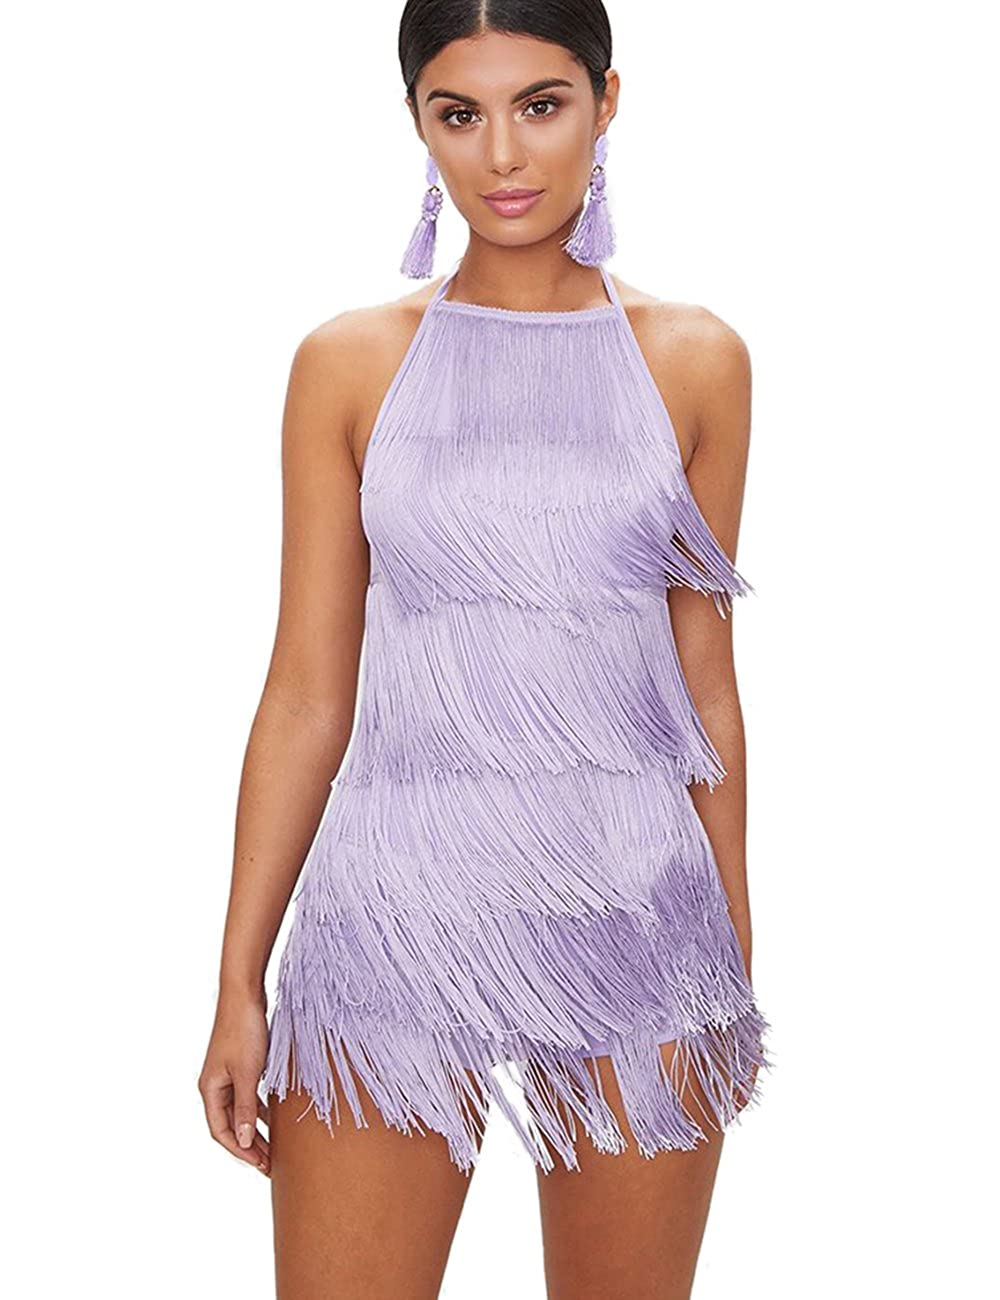 Maketina Women Halter Backless Fringe Tassels Mini Club Bandage Dress at  Amazon Women s Clothing store  f34f48e66390